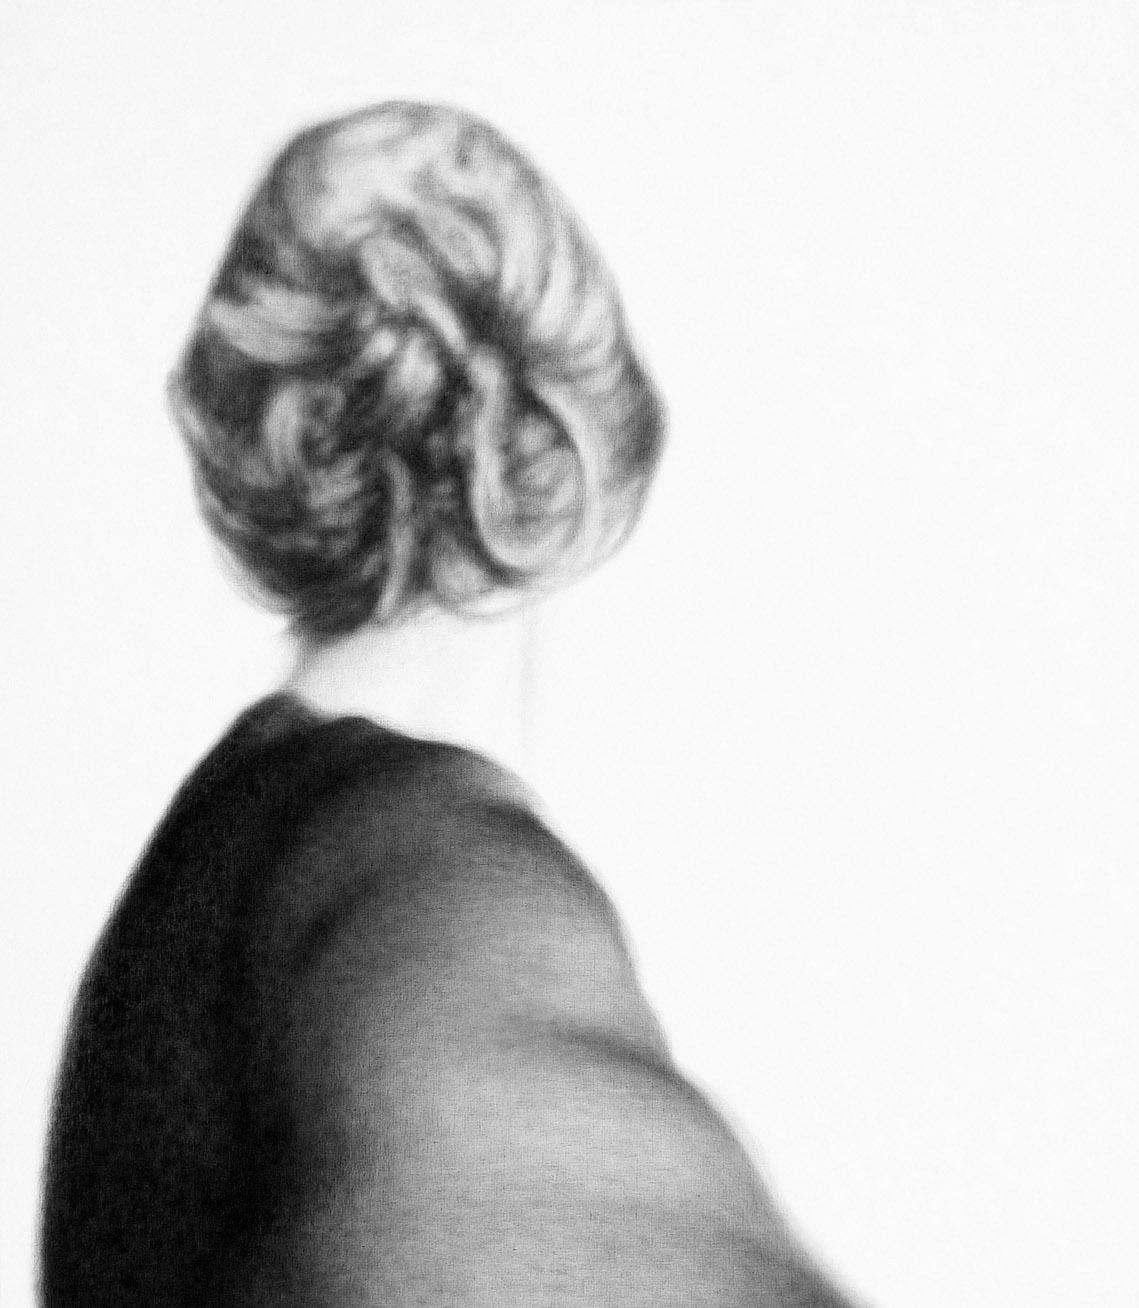 Lique Schoot, Self-portrait 13 07 02